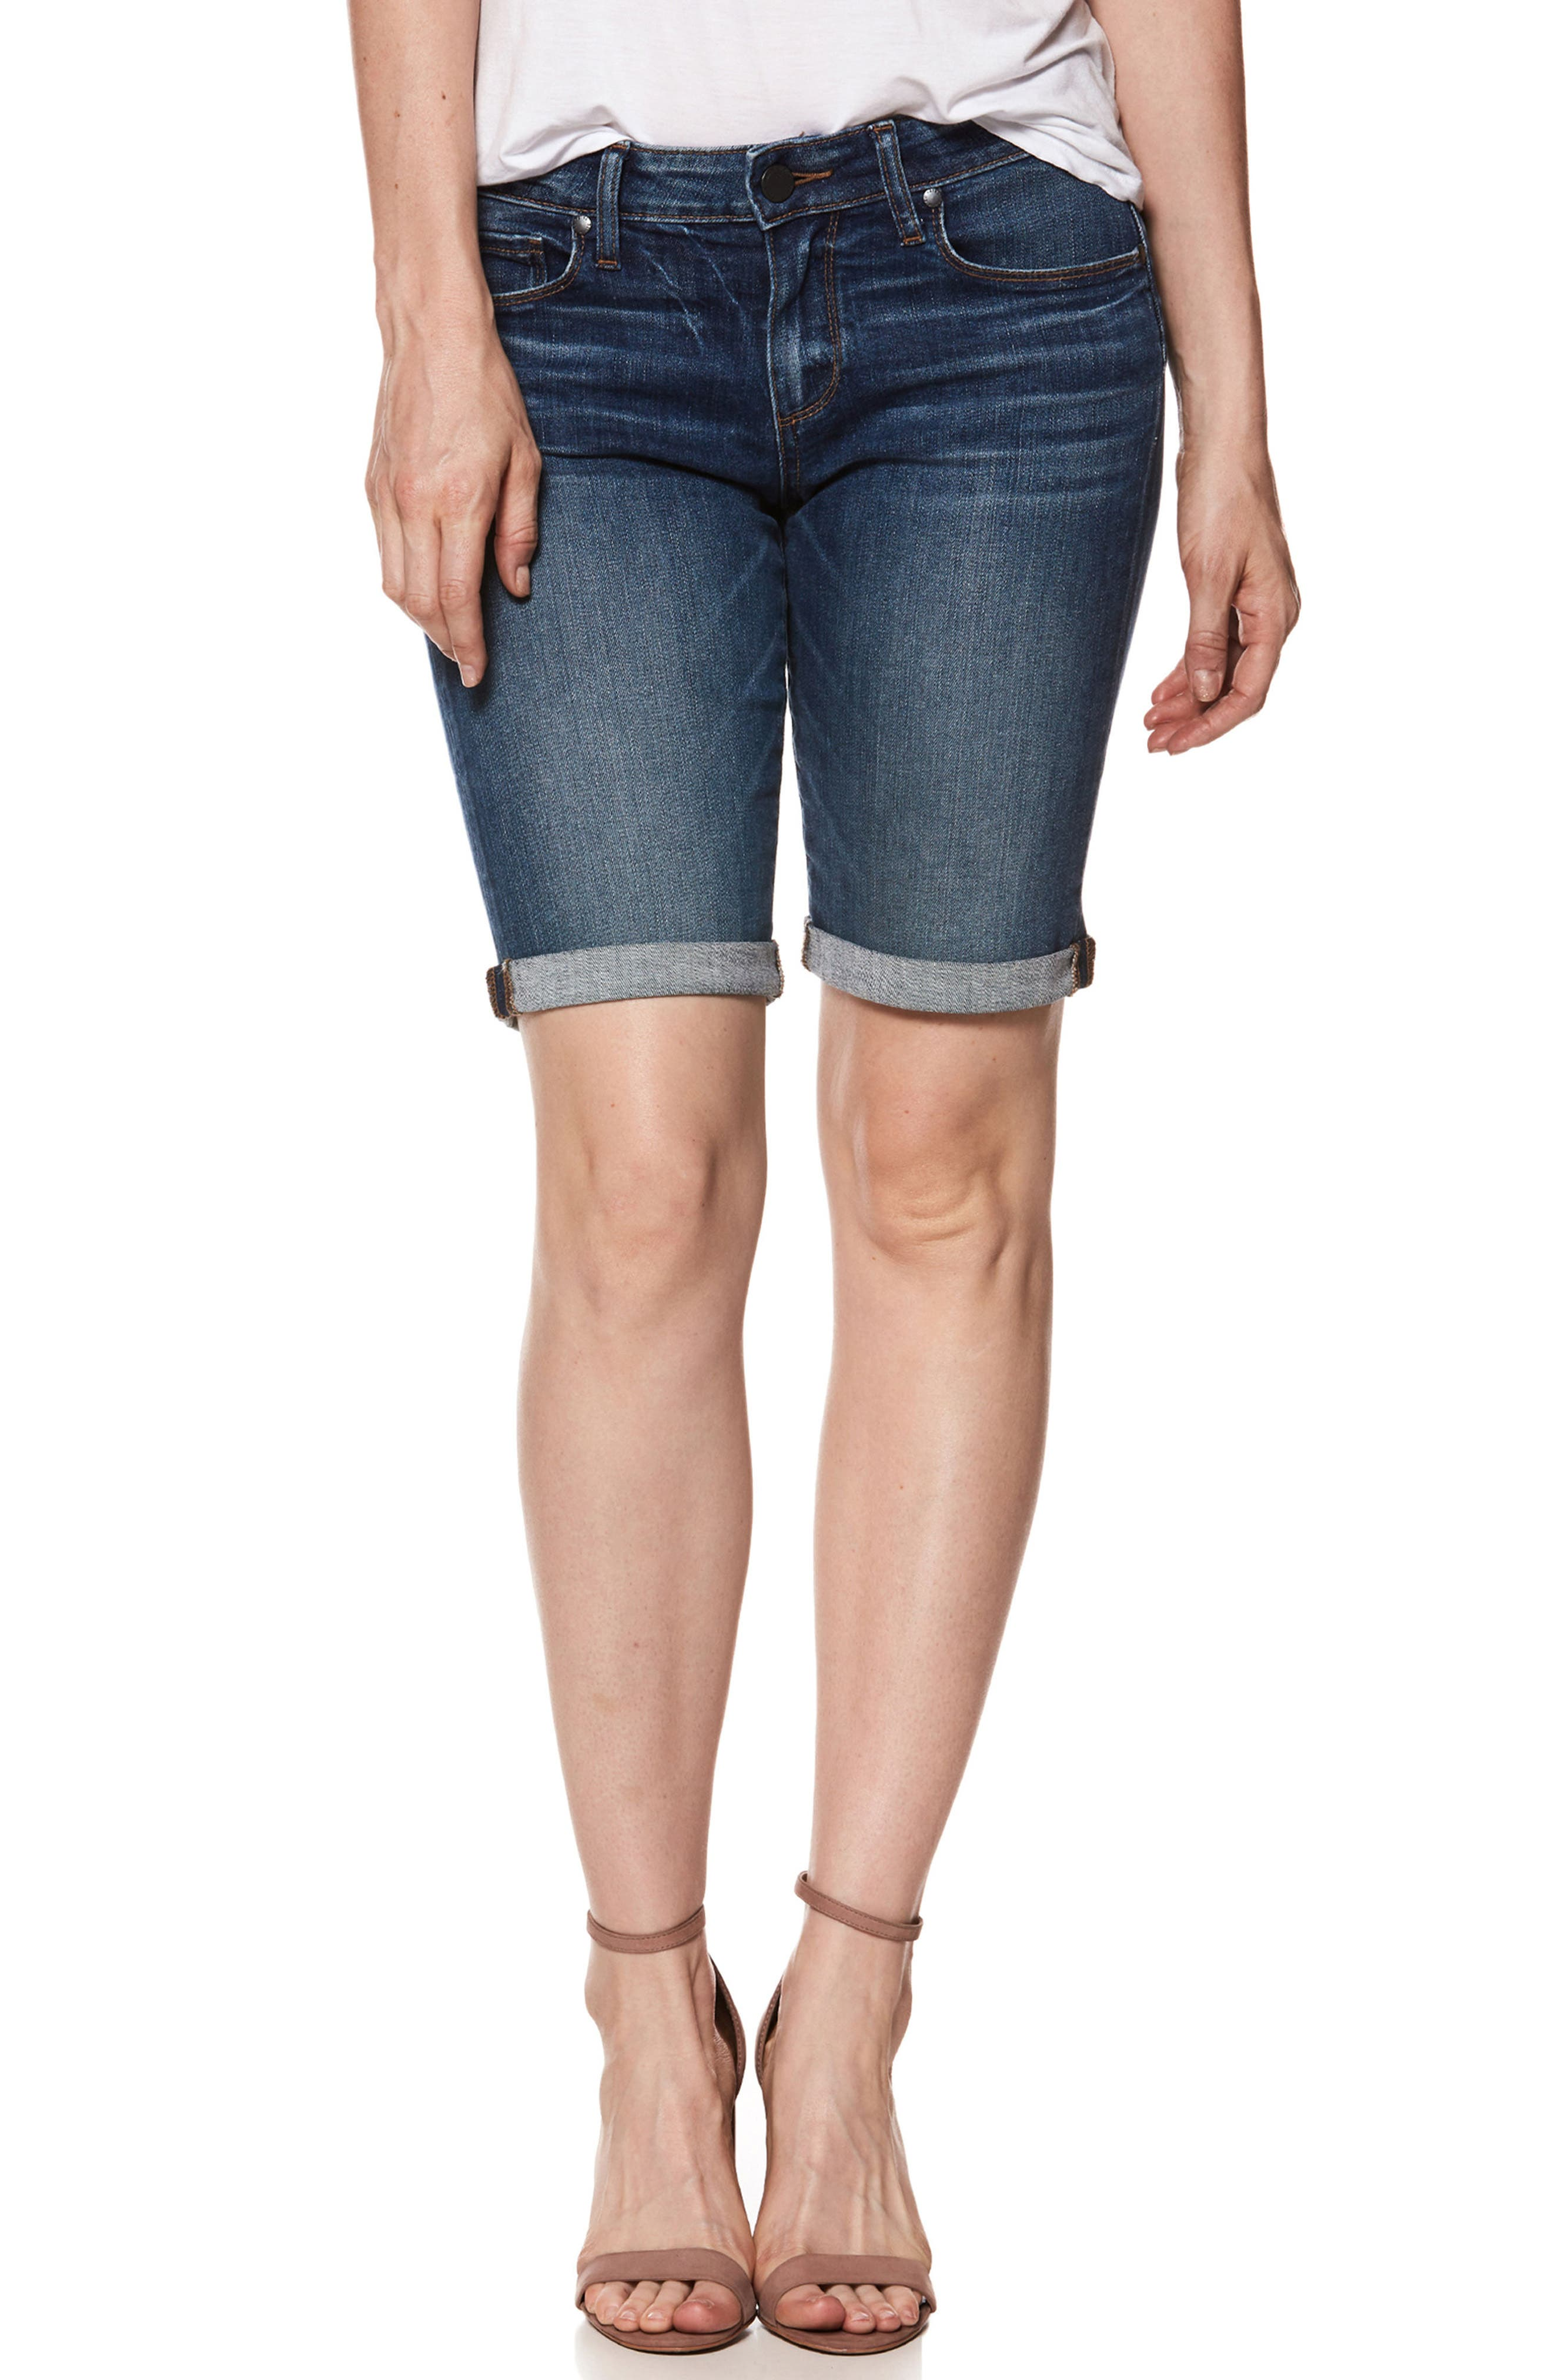 Transcend Vintage - Jax Denim Bermuda Shorts,                             Main thumbnail 1, color,                             Bloomfield